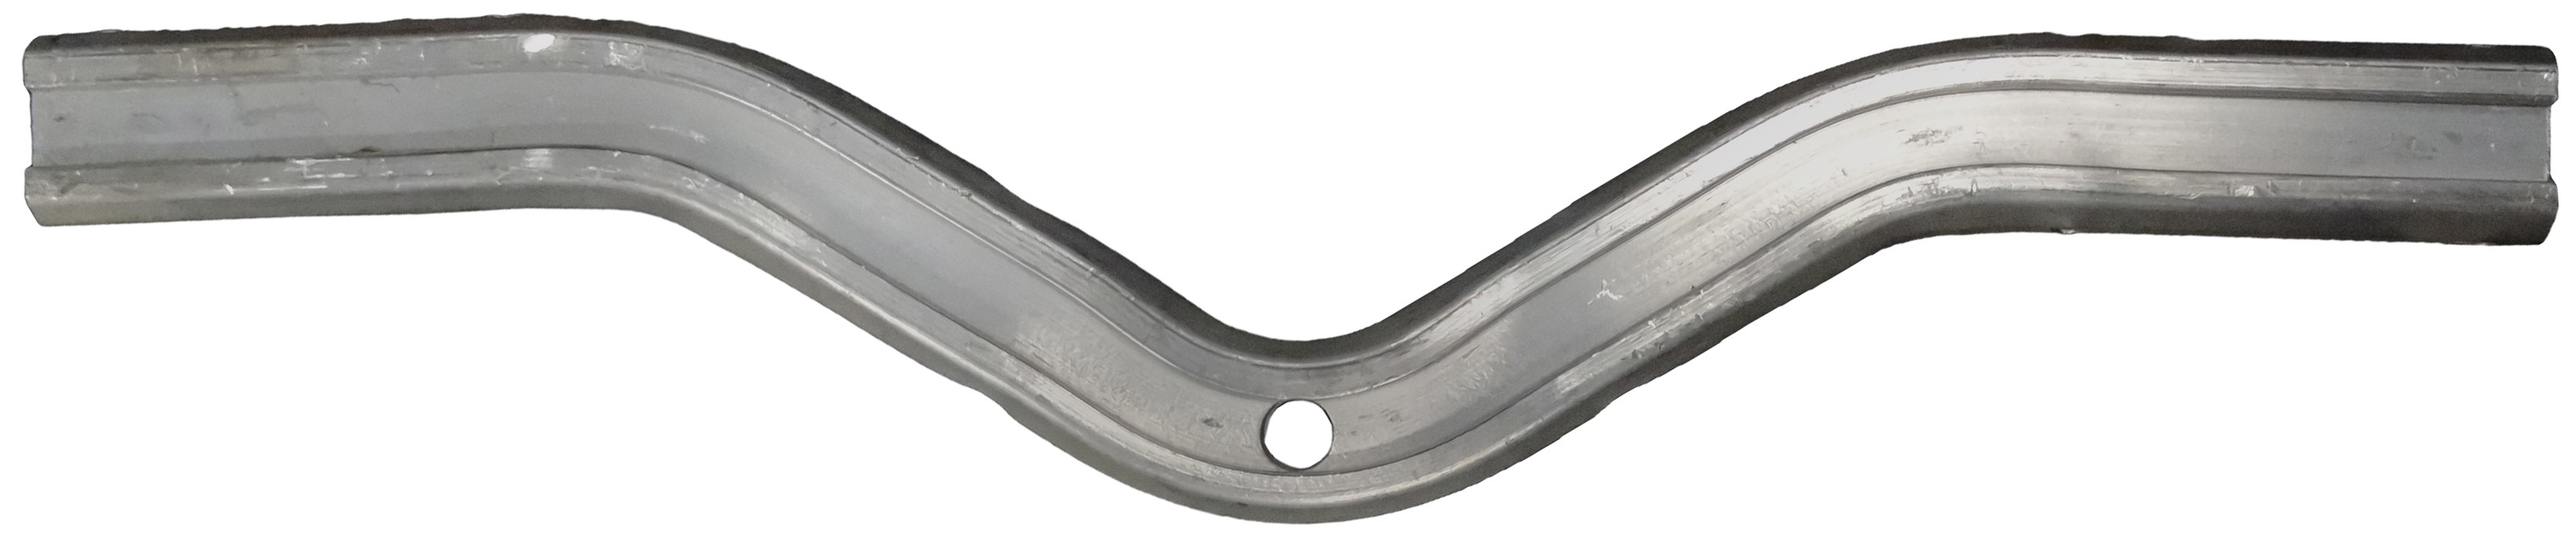 "14"" Wobble Roller Arm - Aluminum"